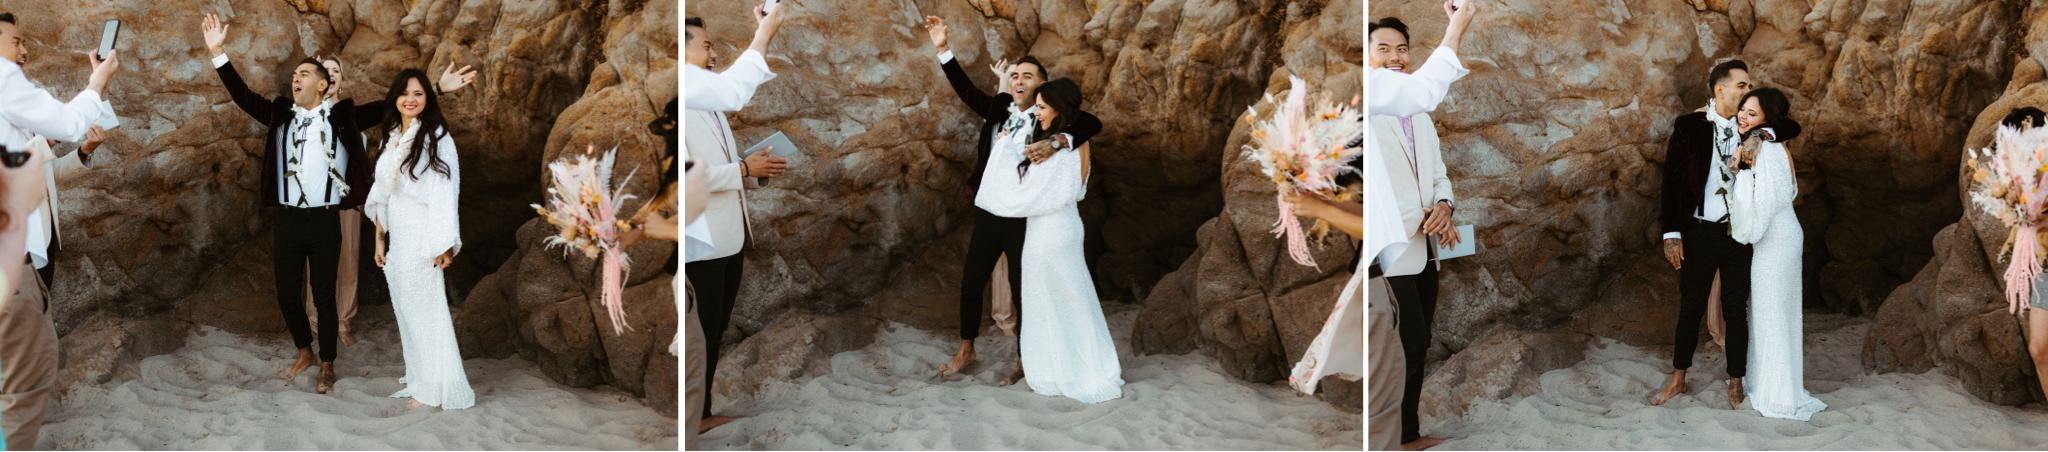 malibu elopement photographer 090